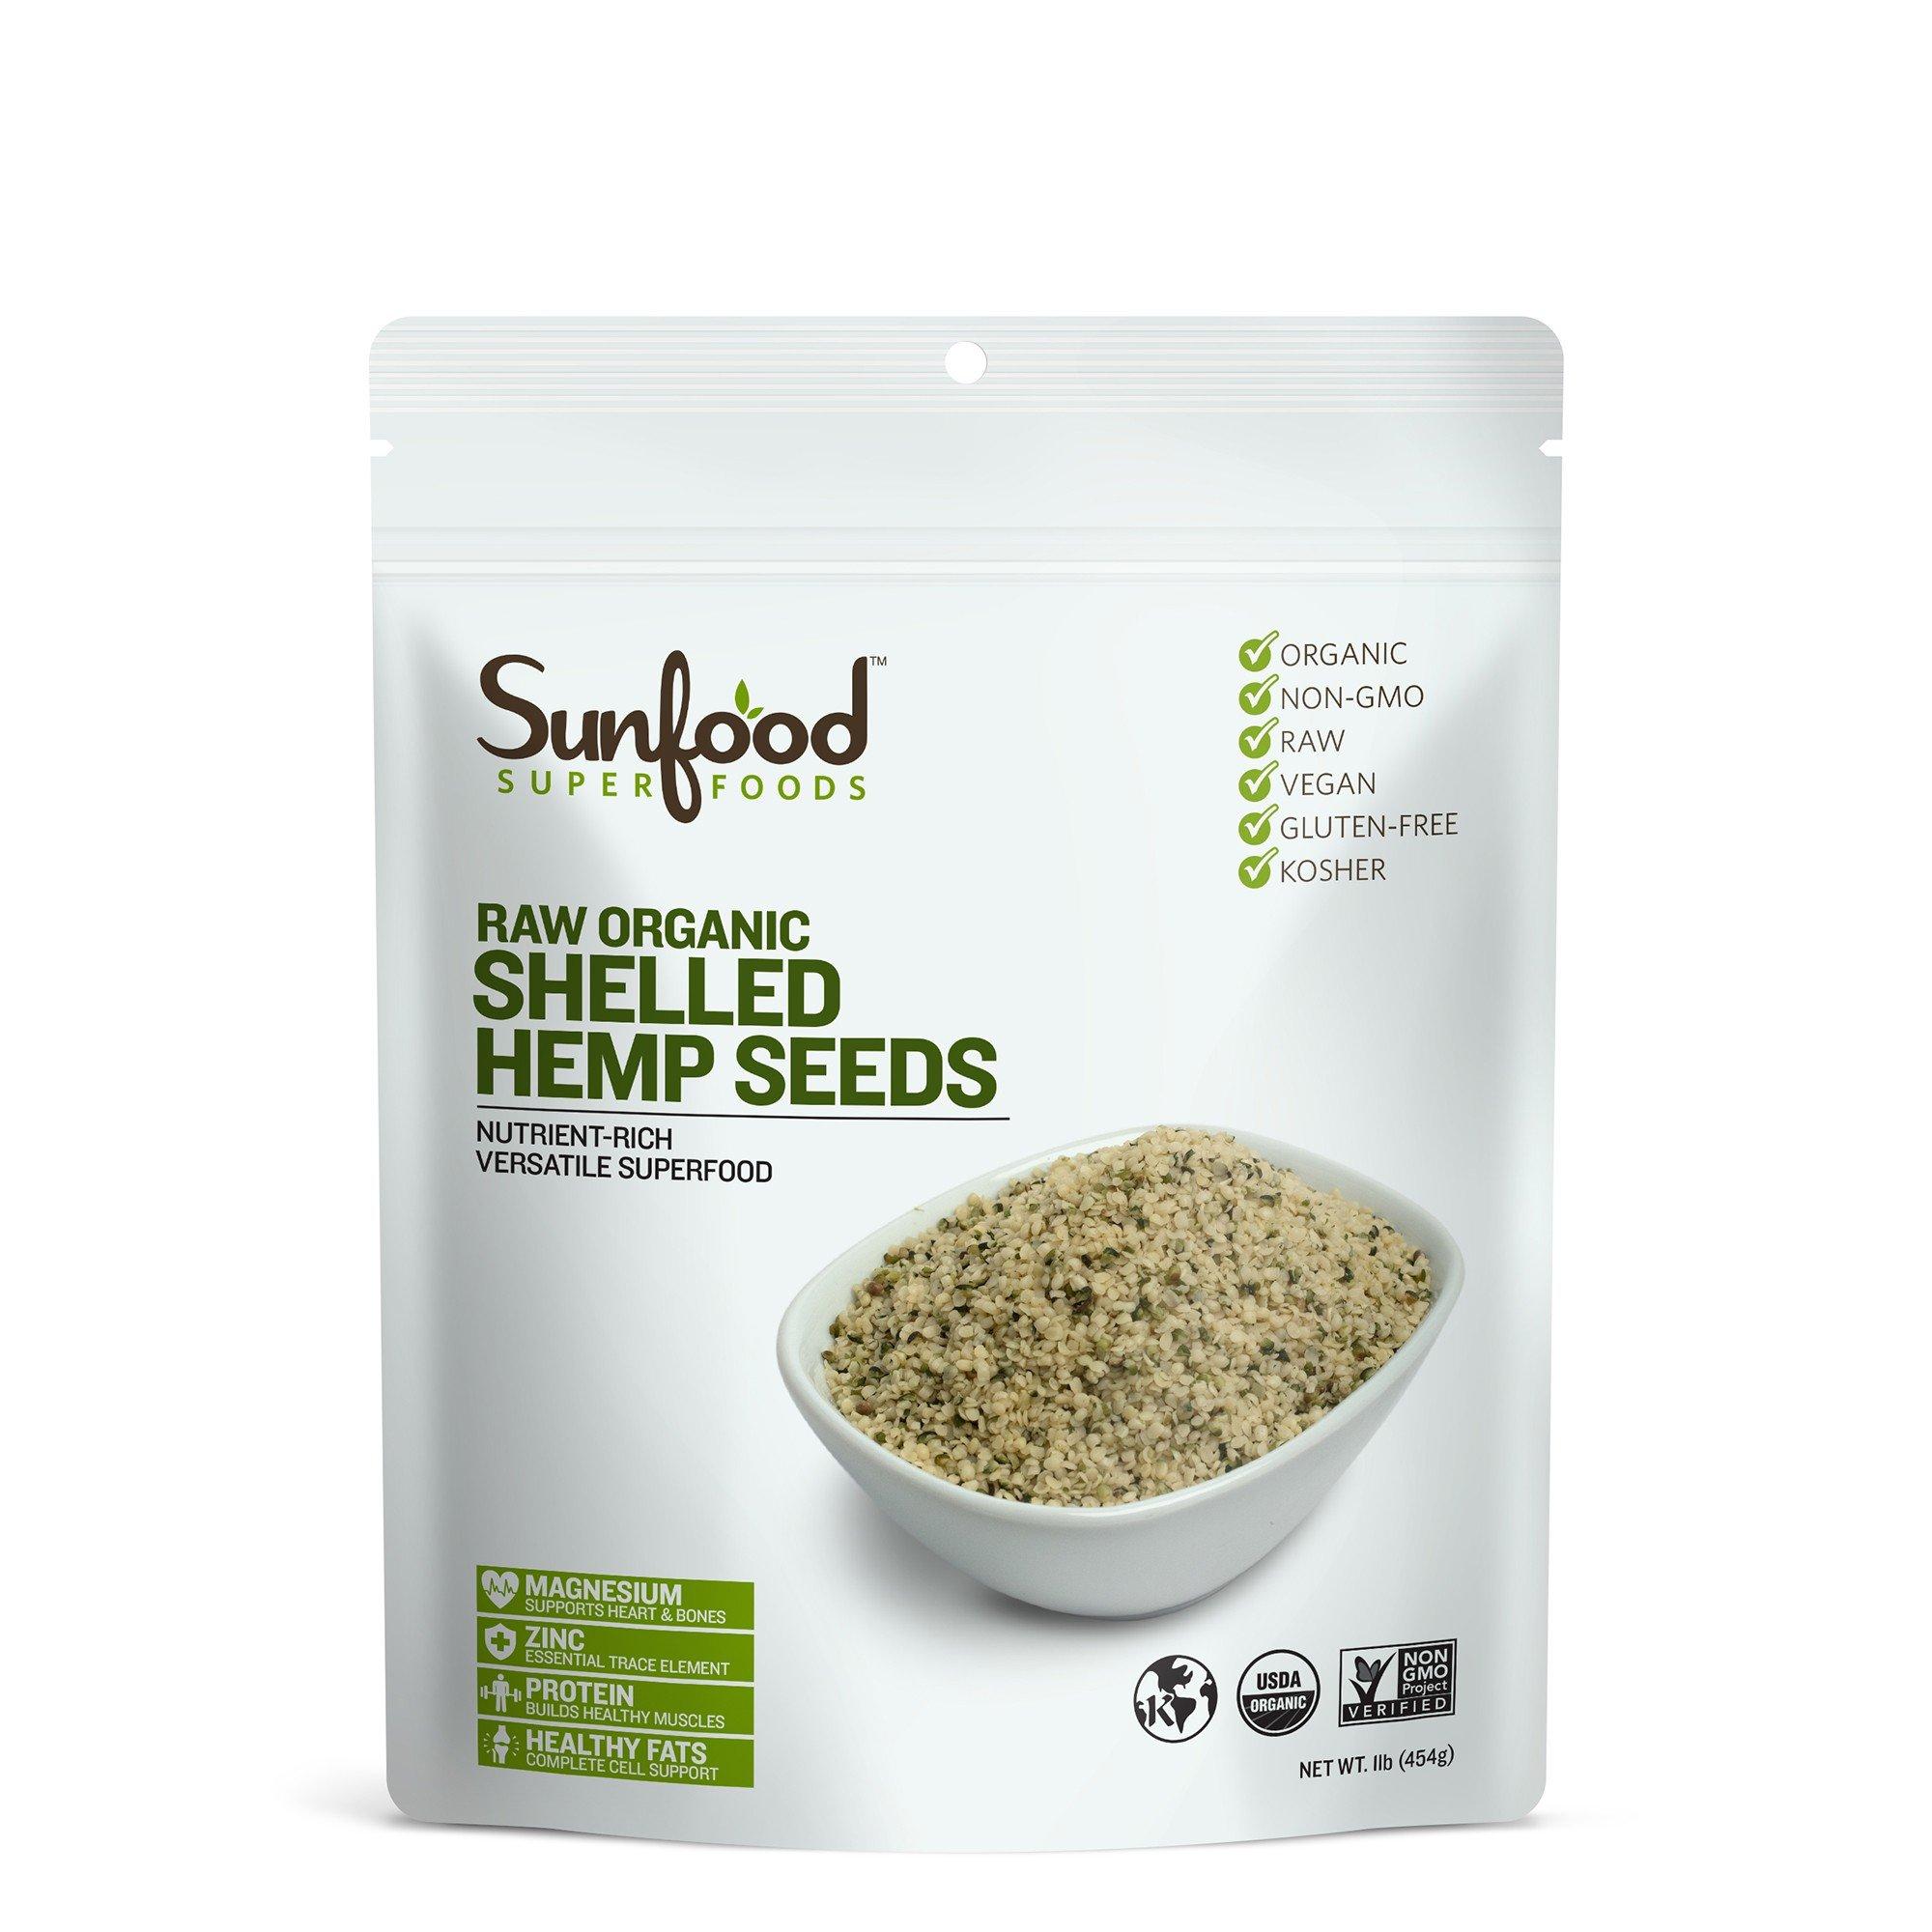 Sunfood Hemp Seeds, Shelled, 1lb, Organic, Raw by Sunfood (Image #5)